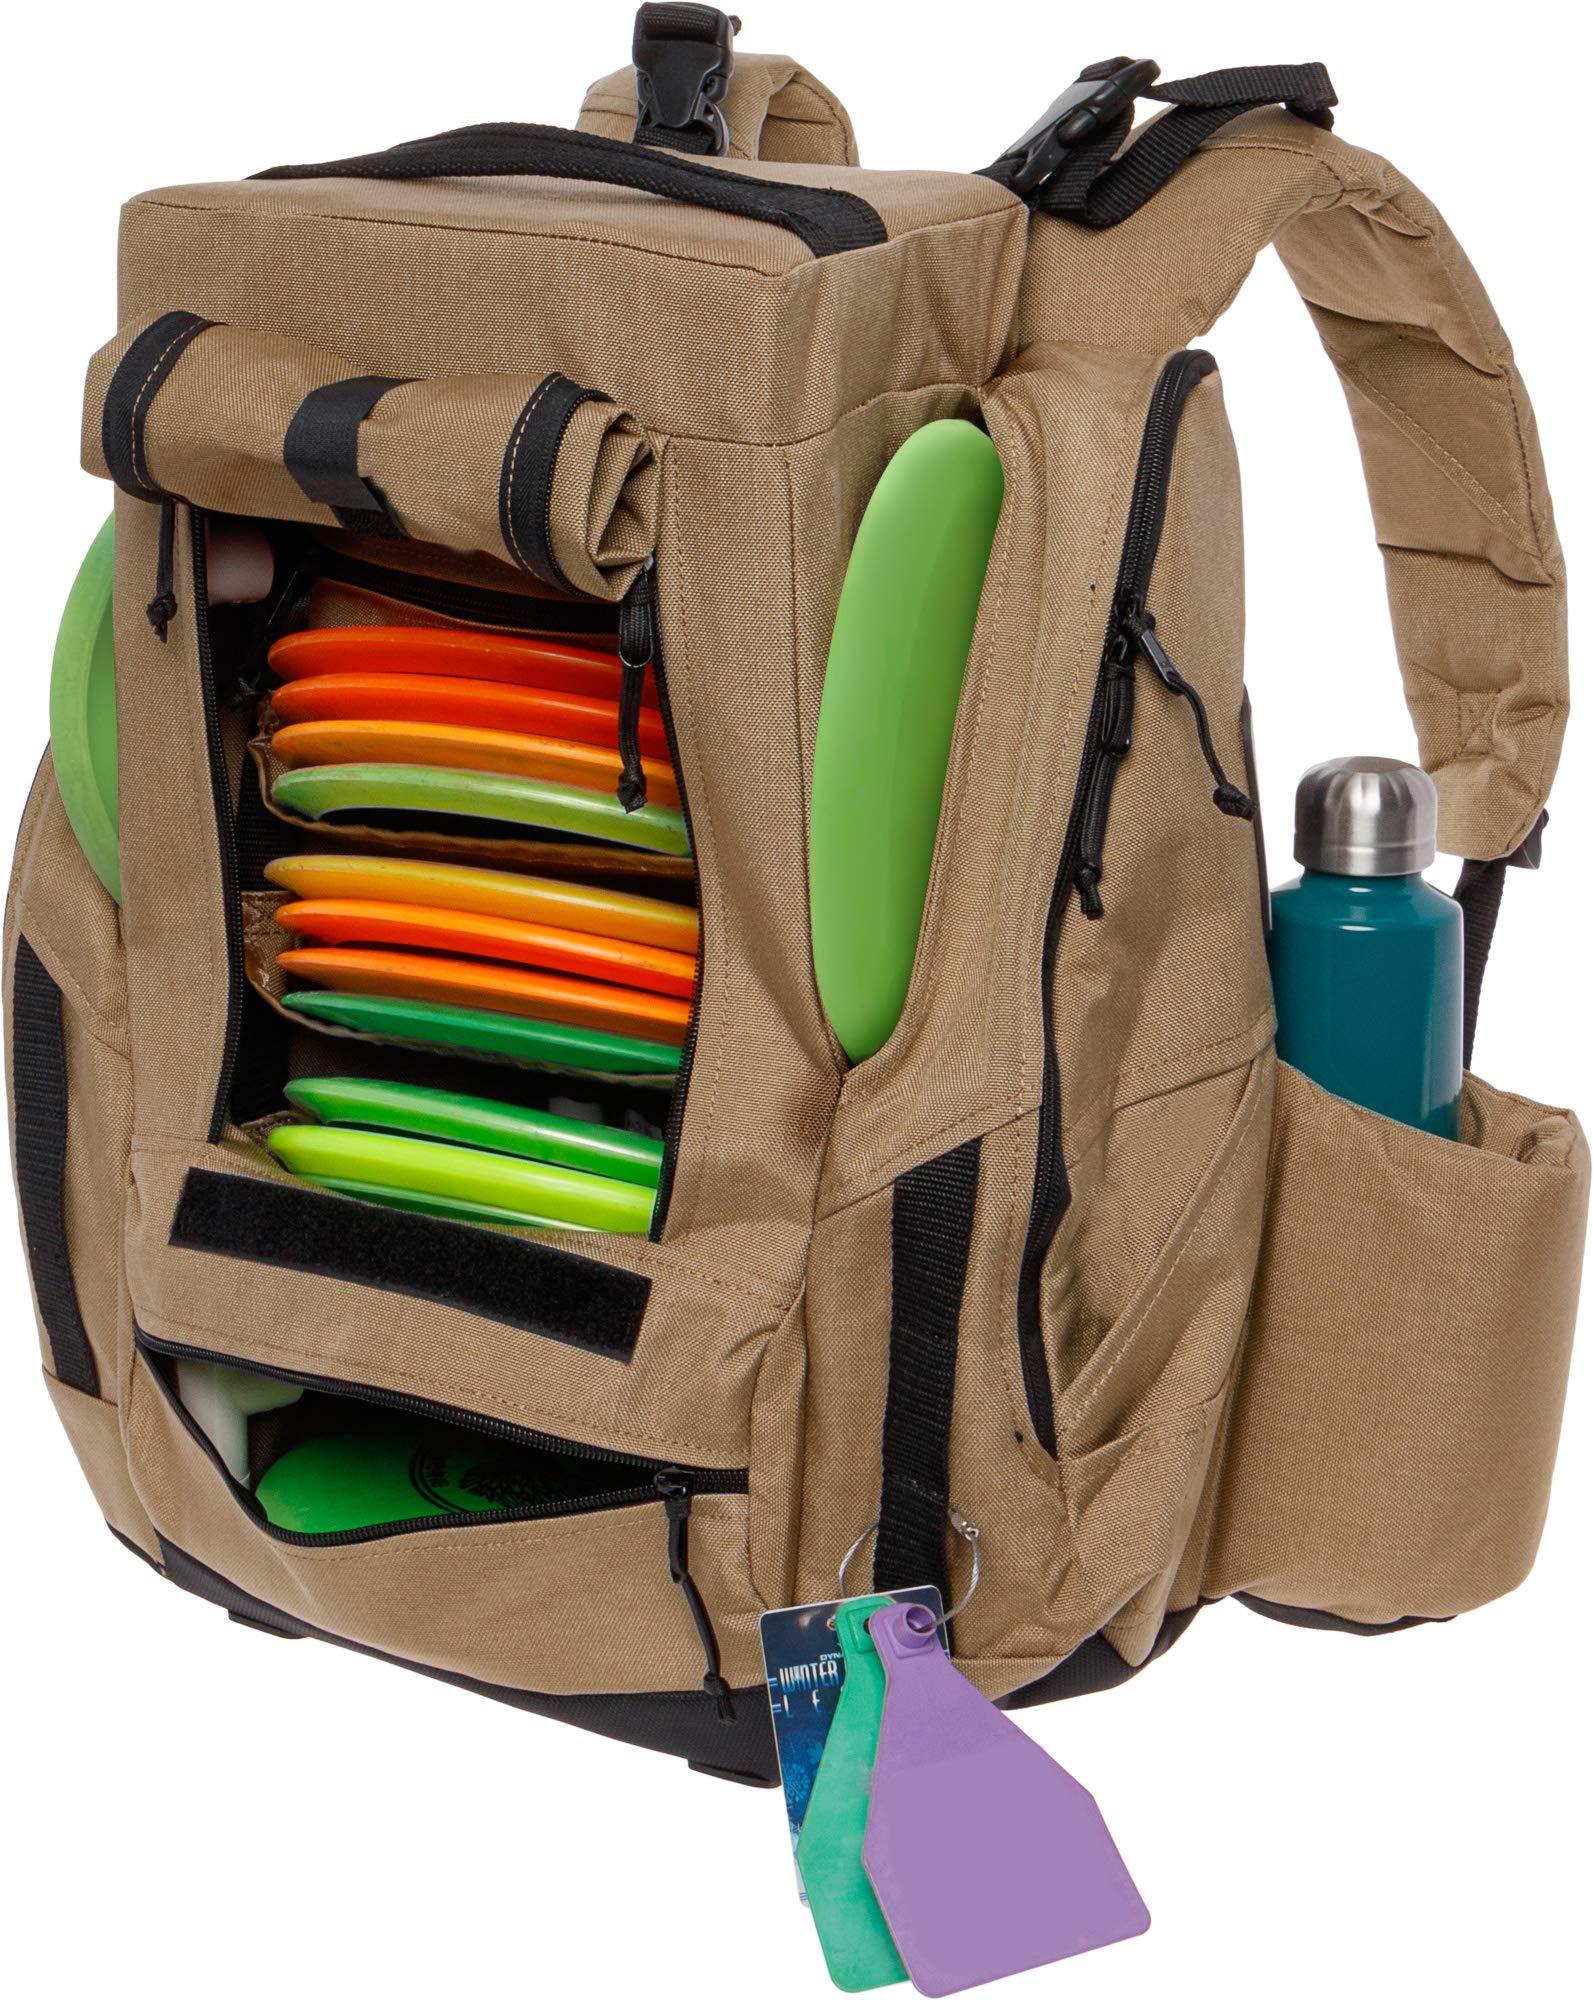 BagLane Fusion Elite Disc Golf Backpack w/Seat & Cooler- 25+ Capacity (Coyote Tan) by BagLane